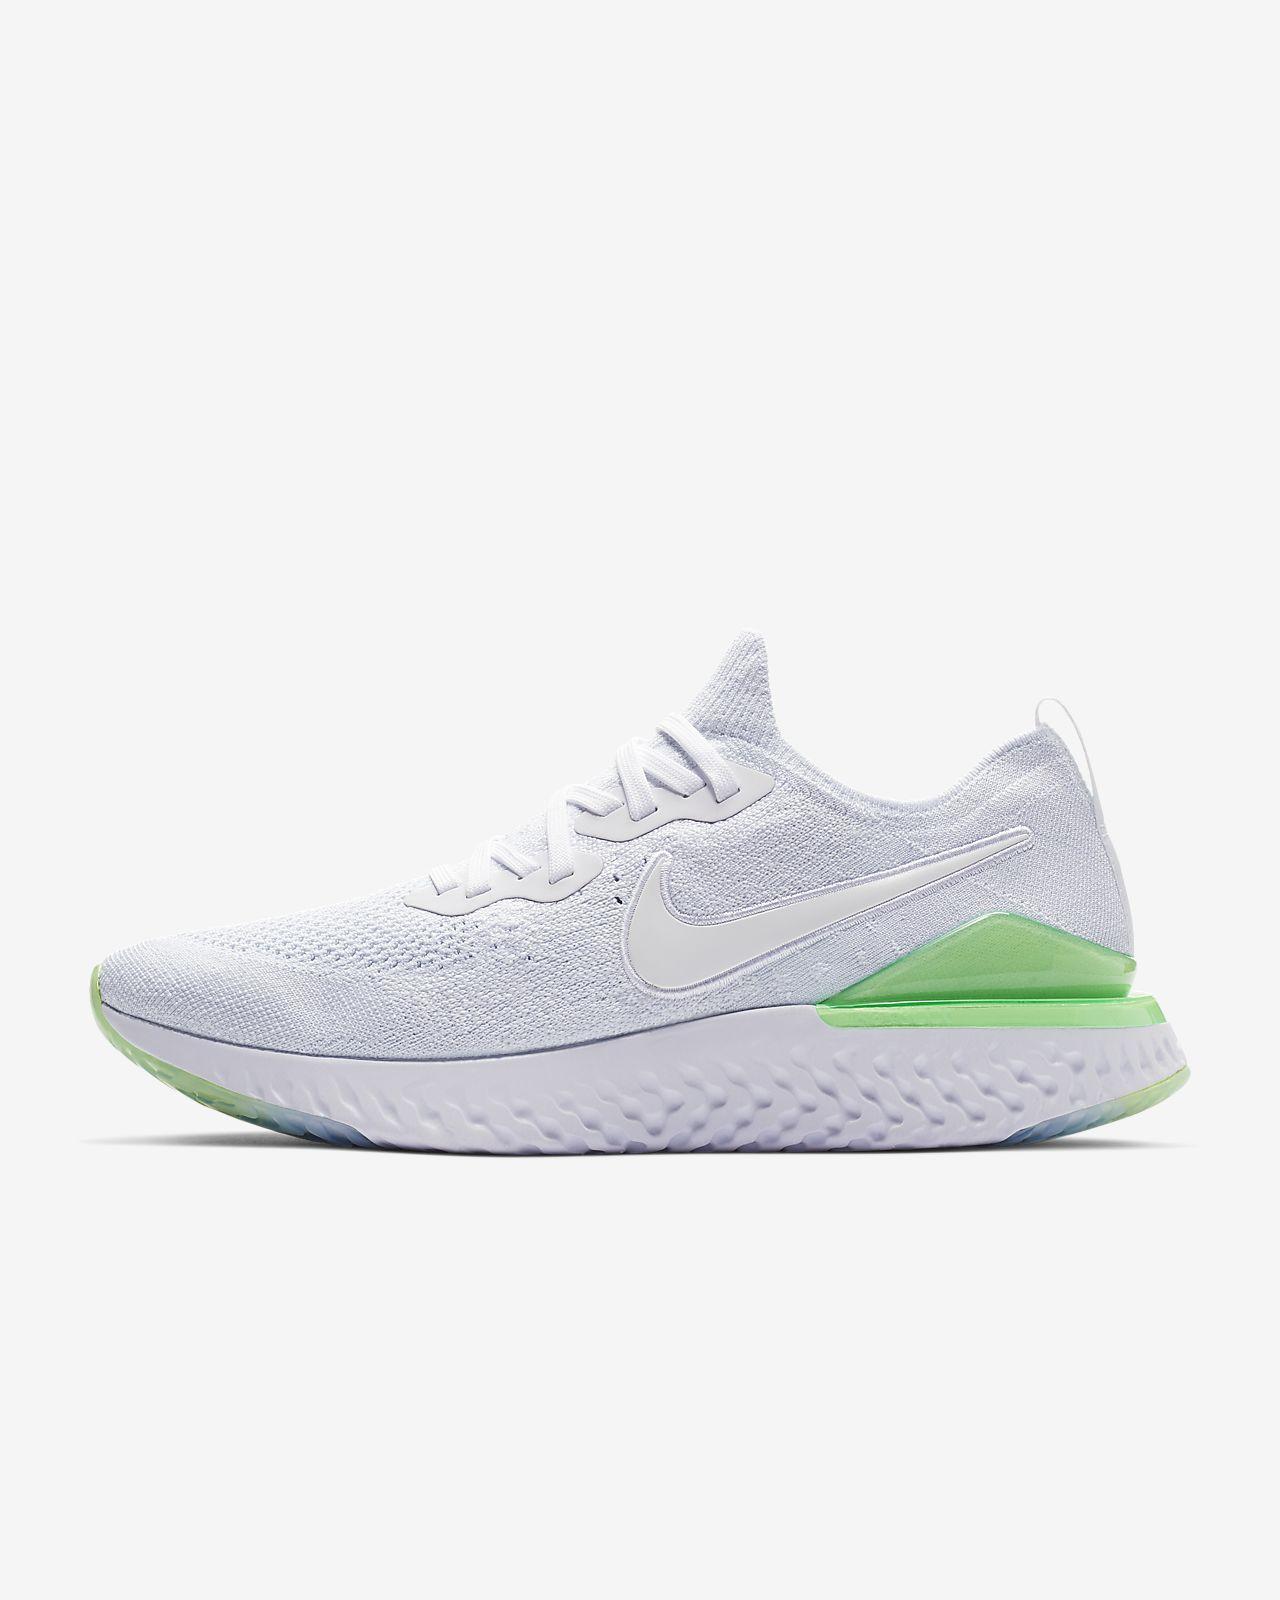 Nike Epic React Flyknit 2 Herren Laufschuh